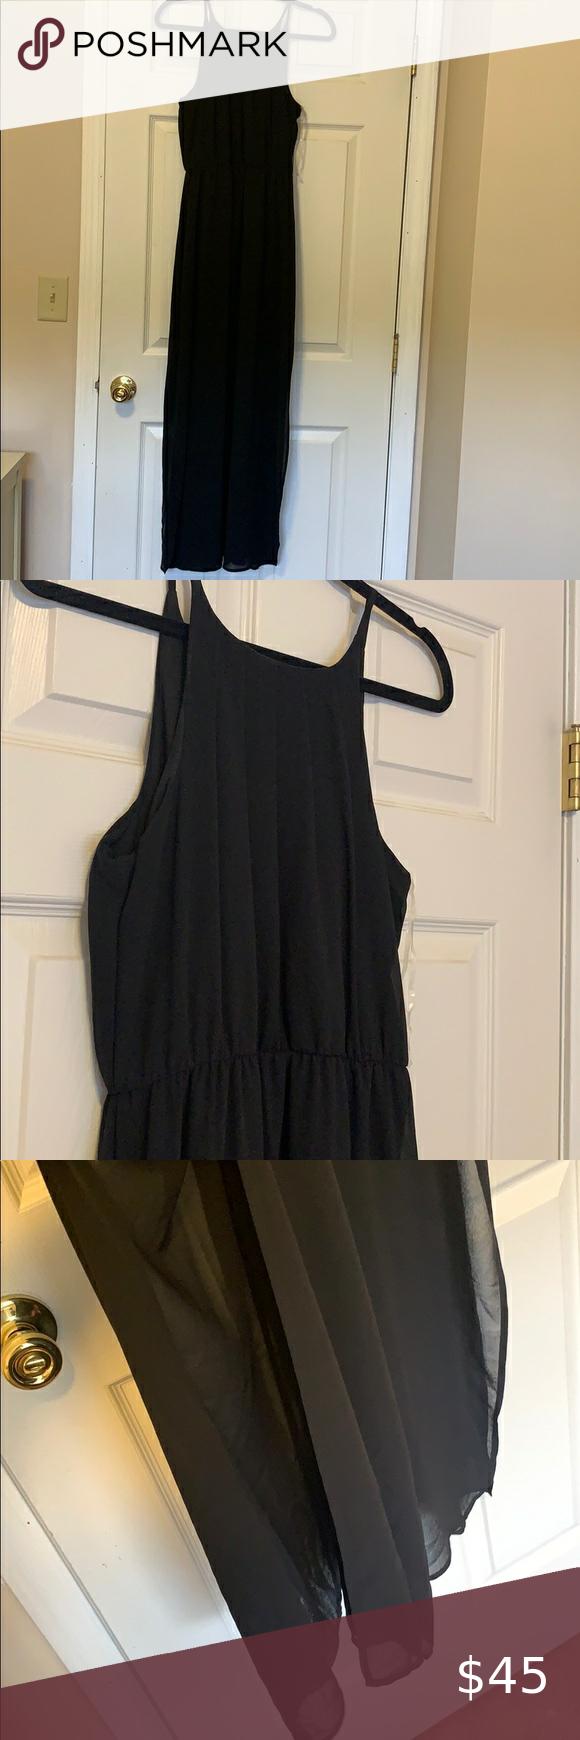 Nwt Francescas Chiffon Black Maxi Dress Black Maxi Dress Maxi Dress Black Maxi [ 1740 x 580 Pixel ]